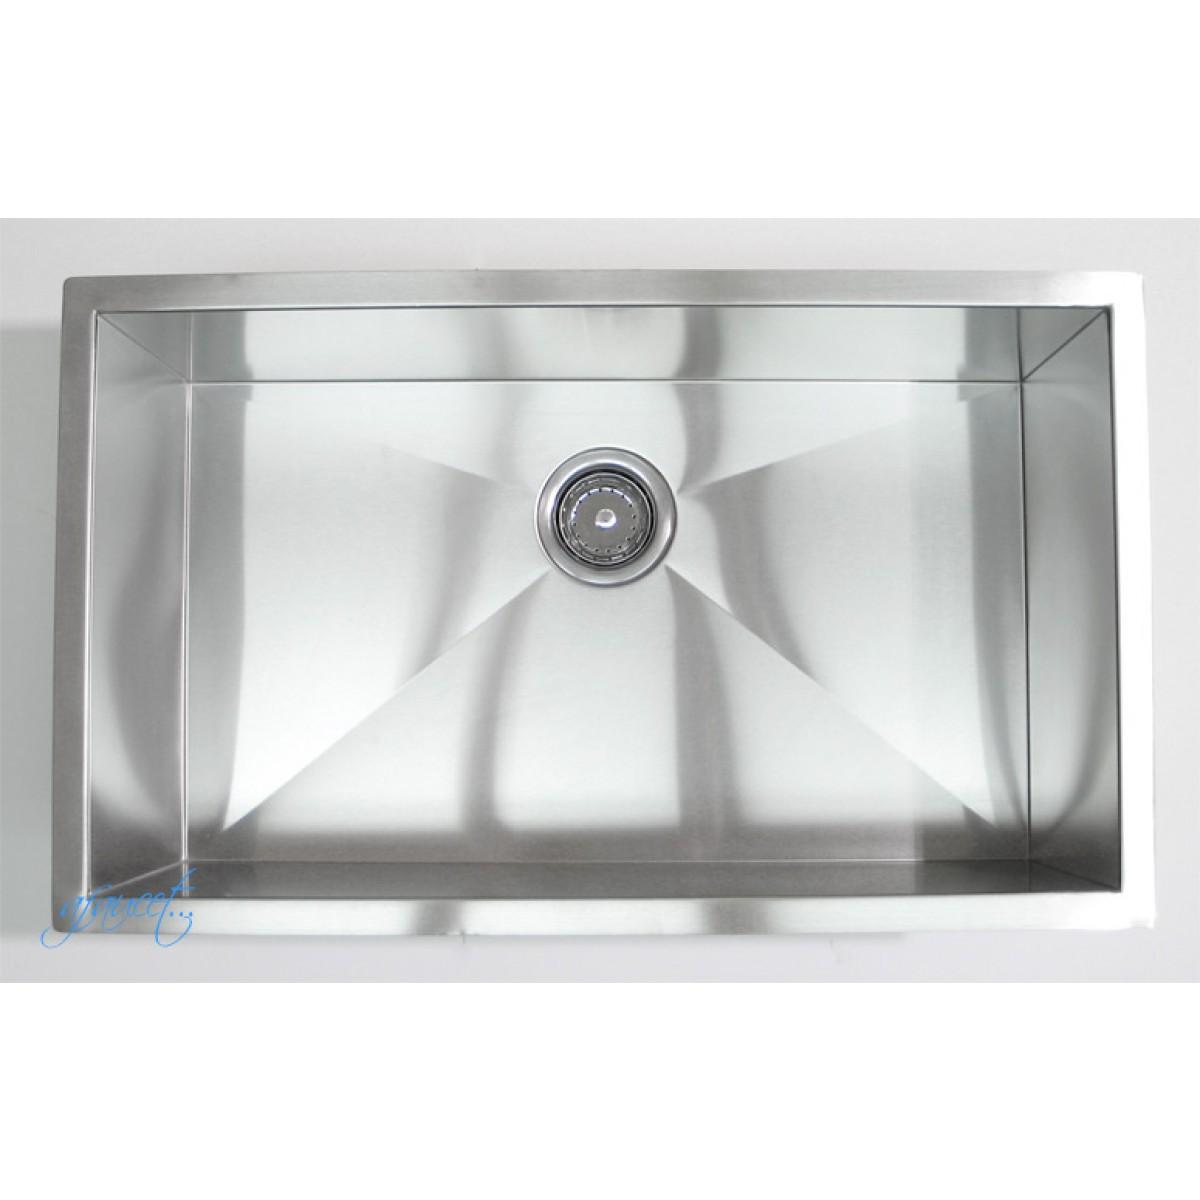 Inch Zero Radius Stainless Steel Undermount Single Bowl Kitchen Sink ...